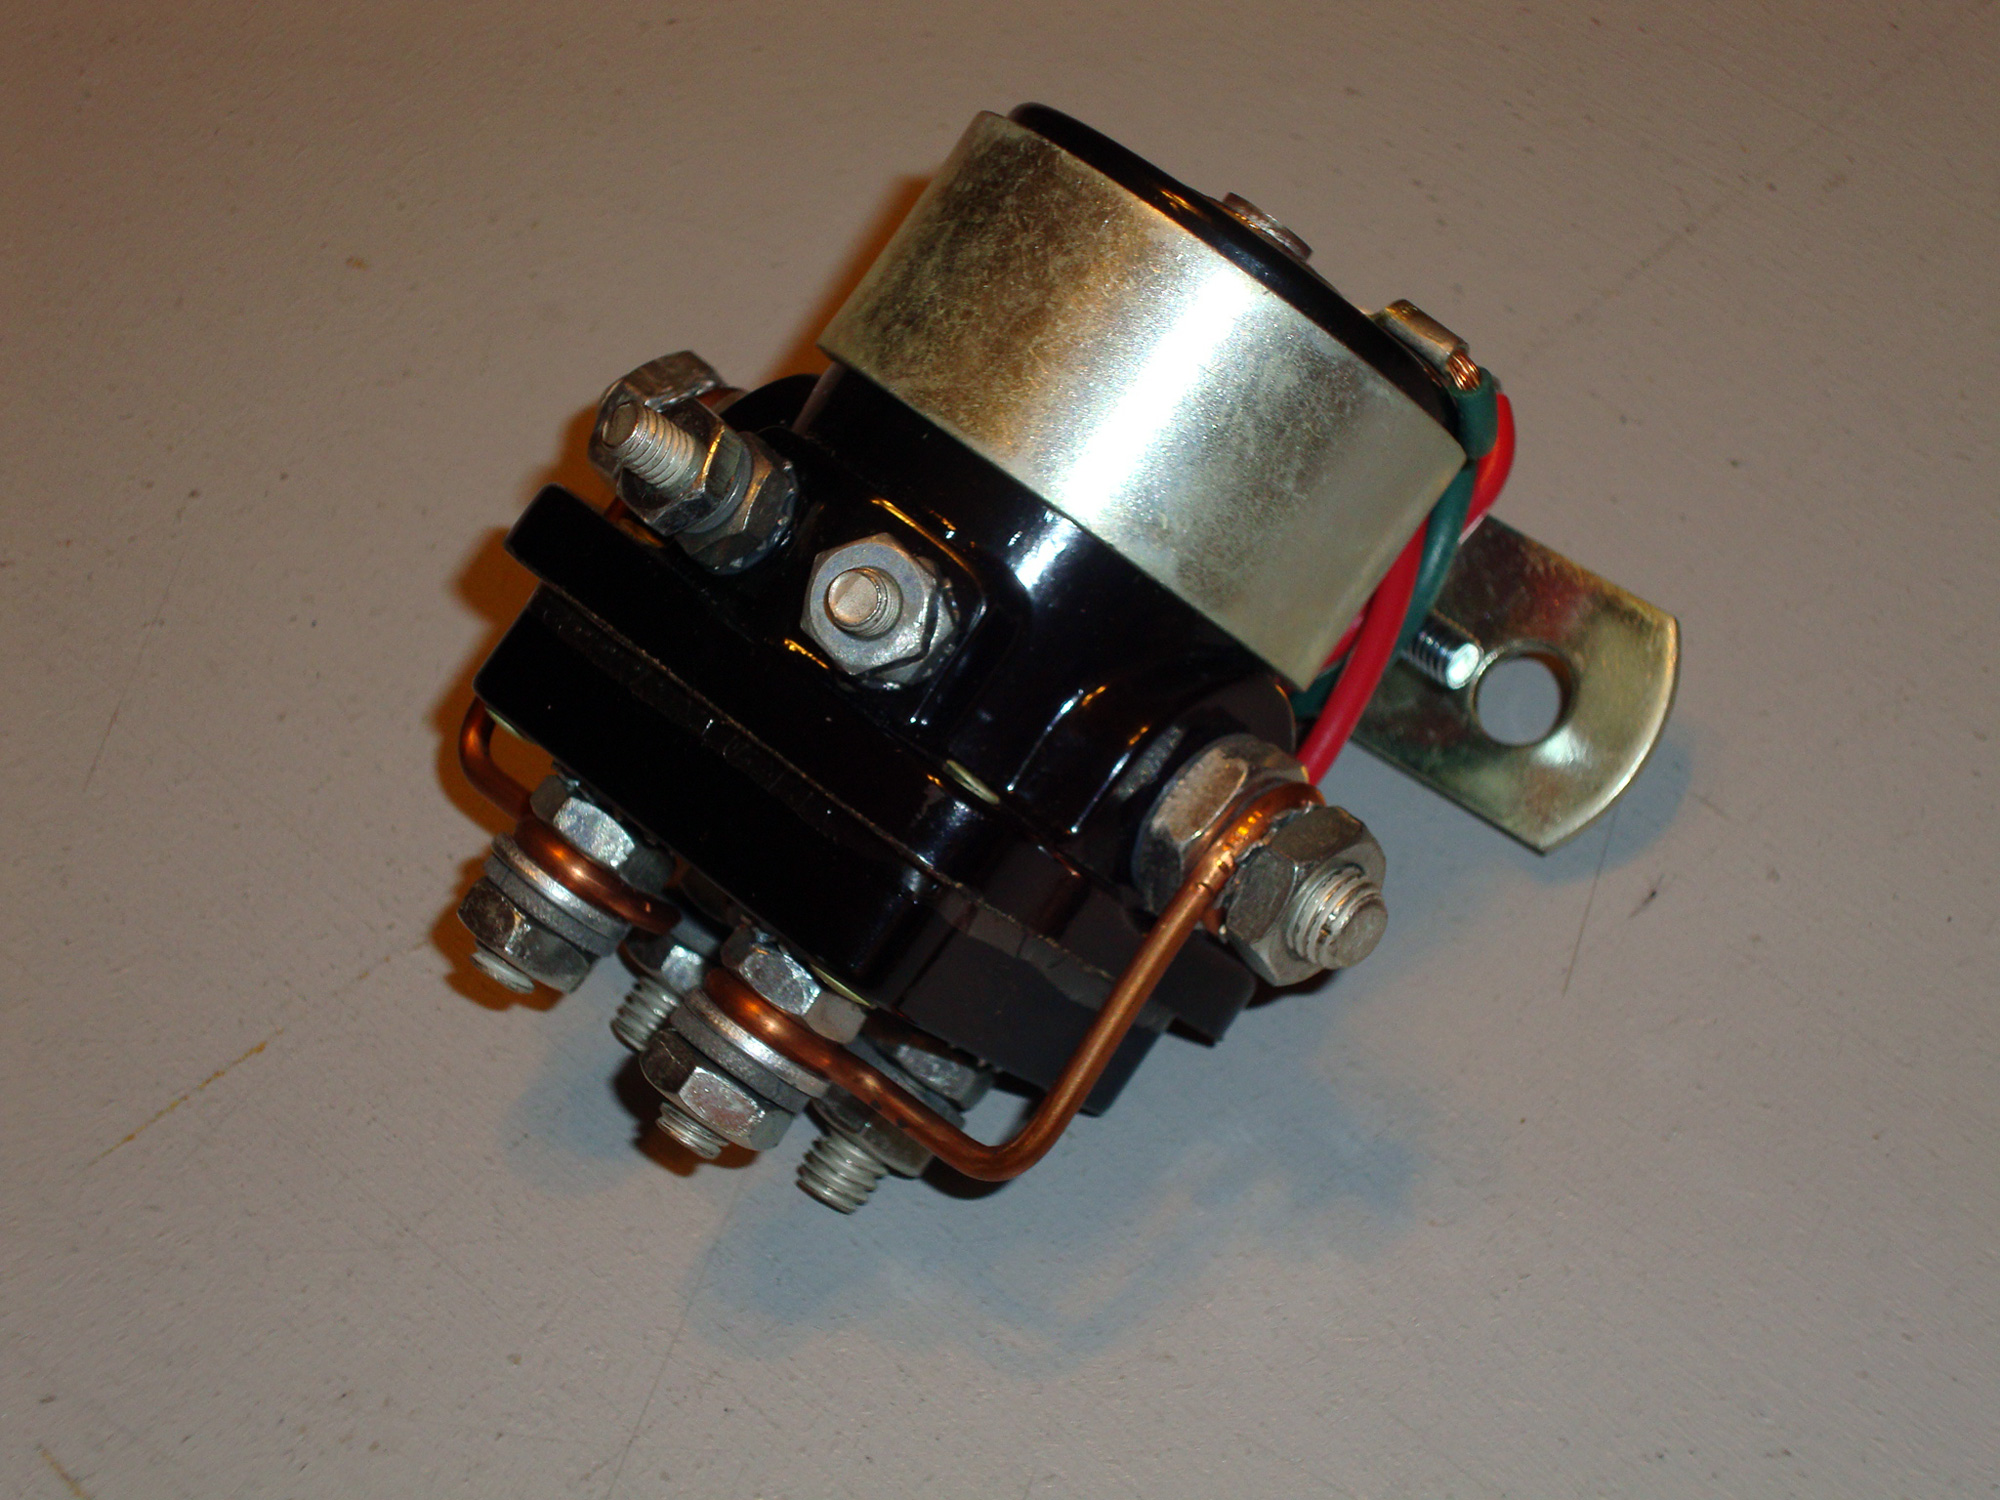 400-comanche-24-volt-staring-system-1